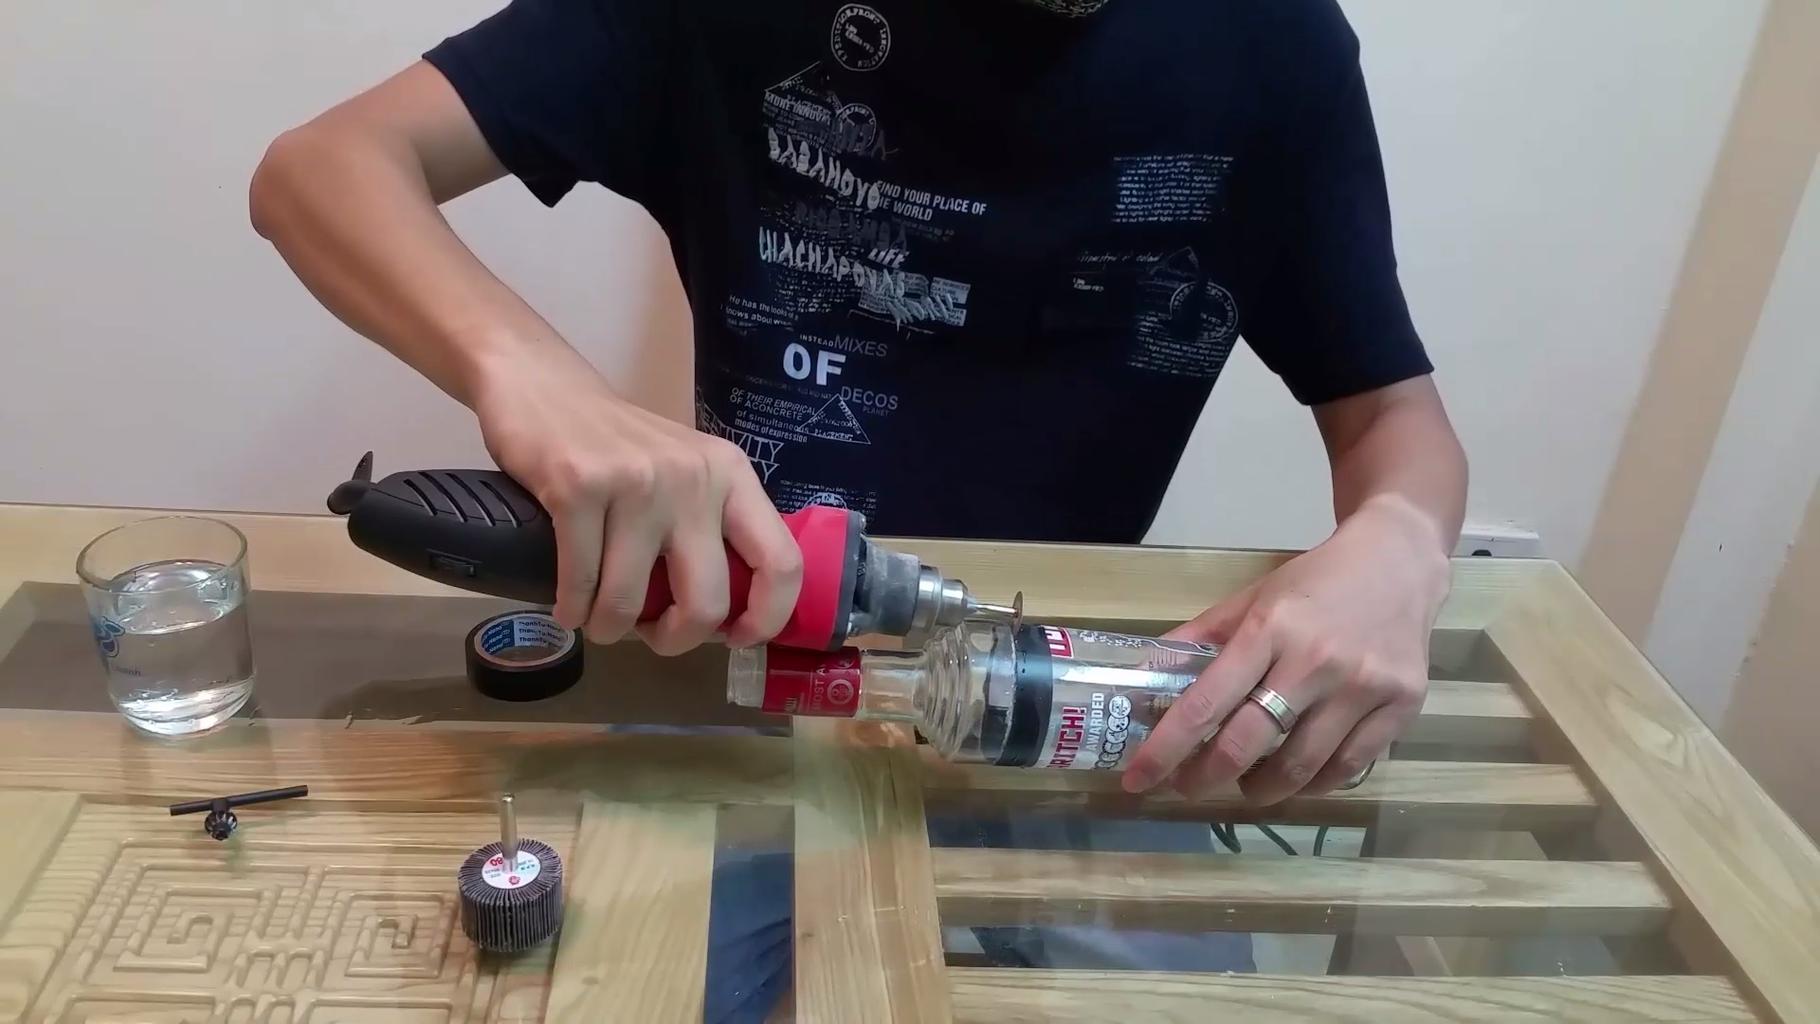 Step 2: Cut the Bottle